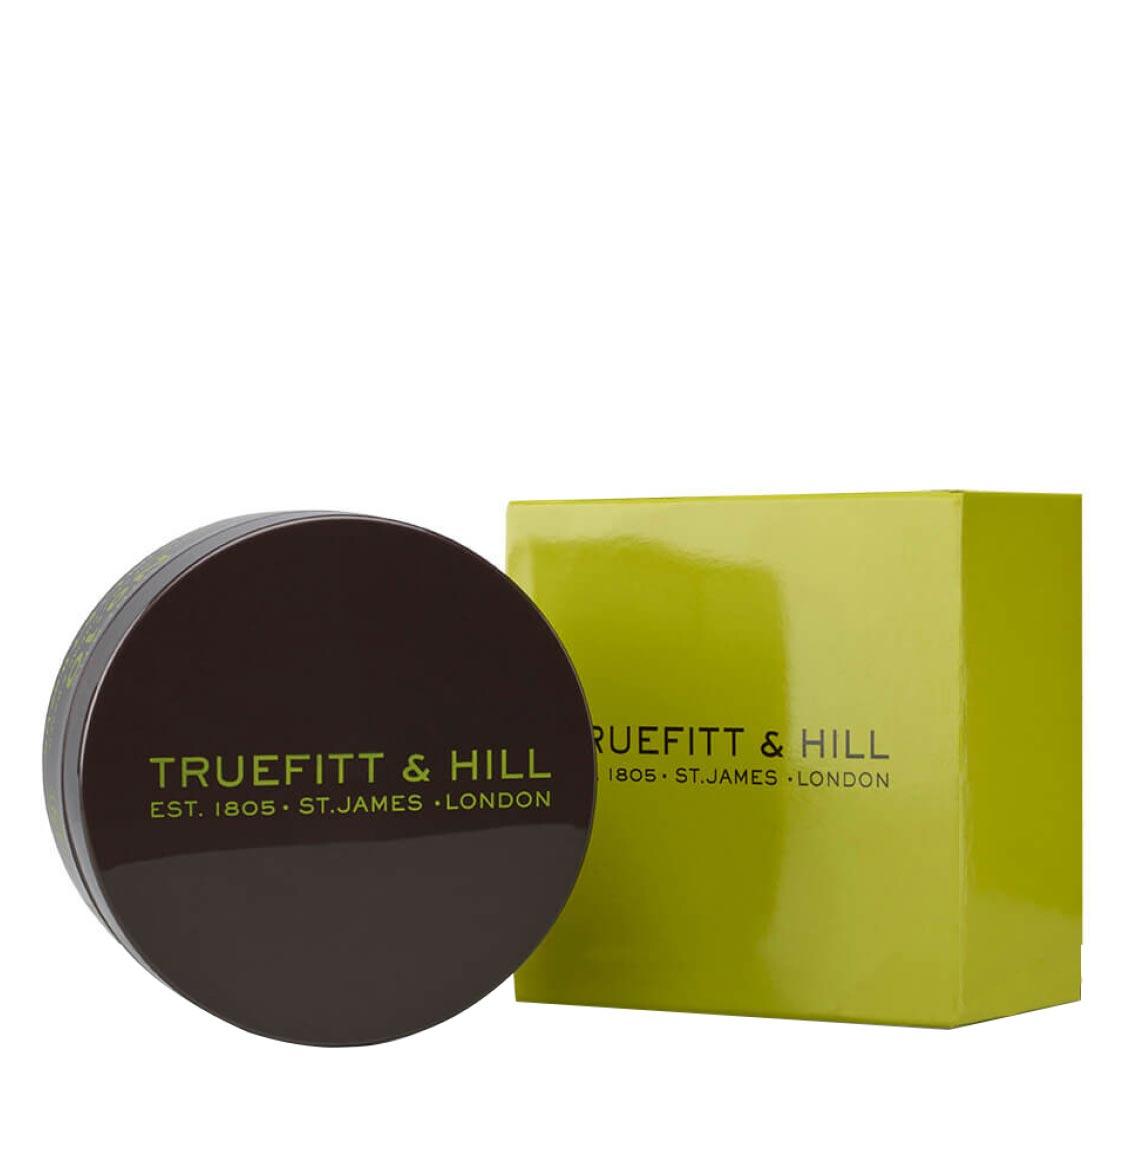 Truefitt And Hill No. 10 Shaving Cream Bowl 200ml